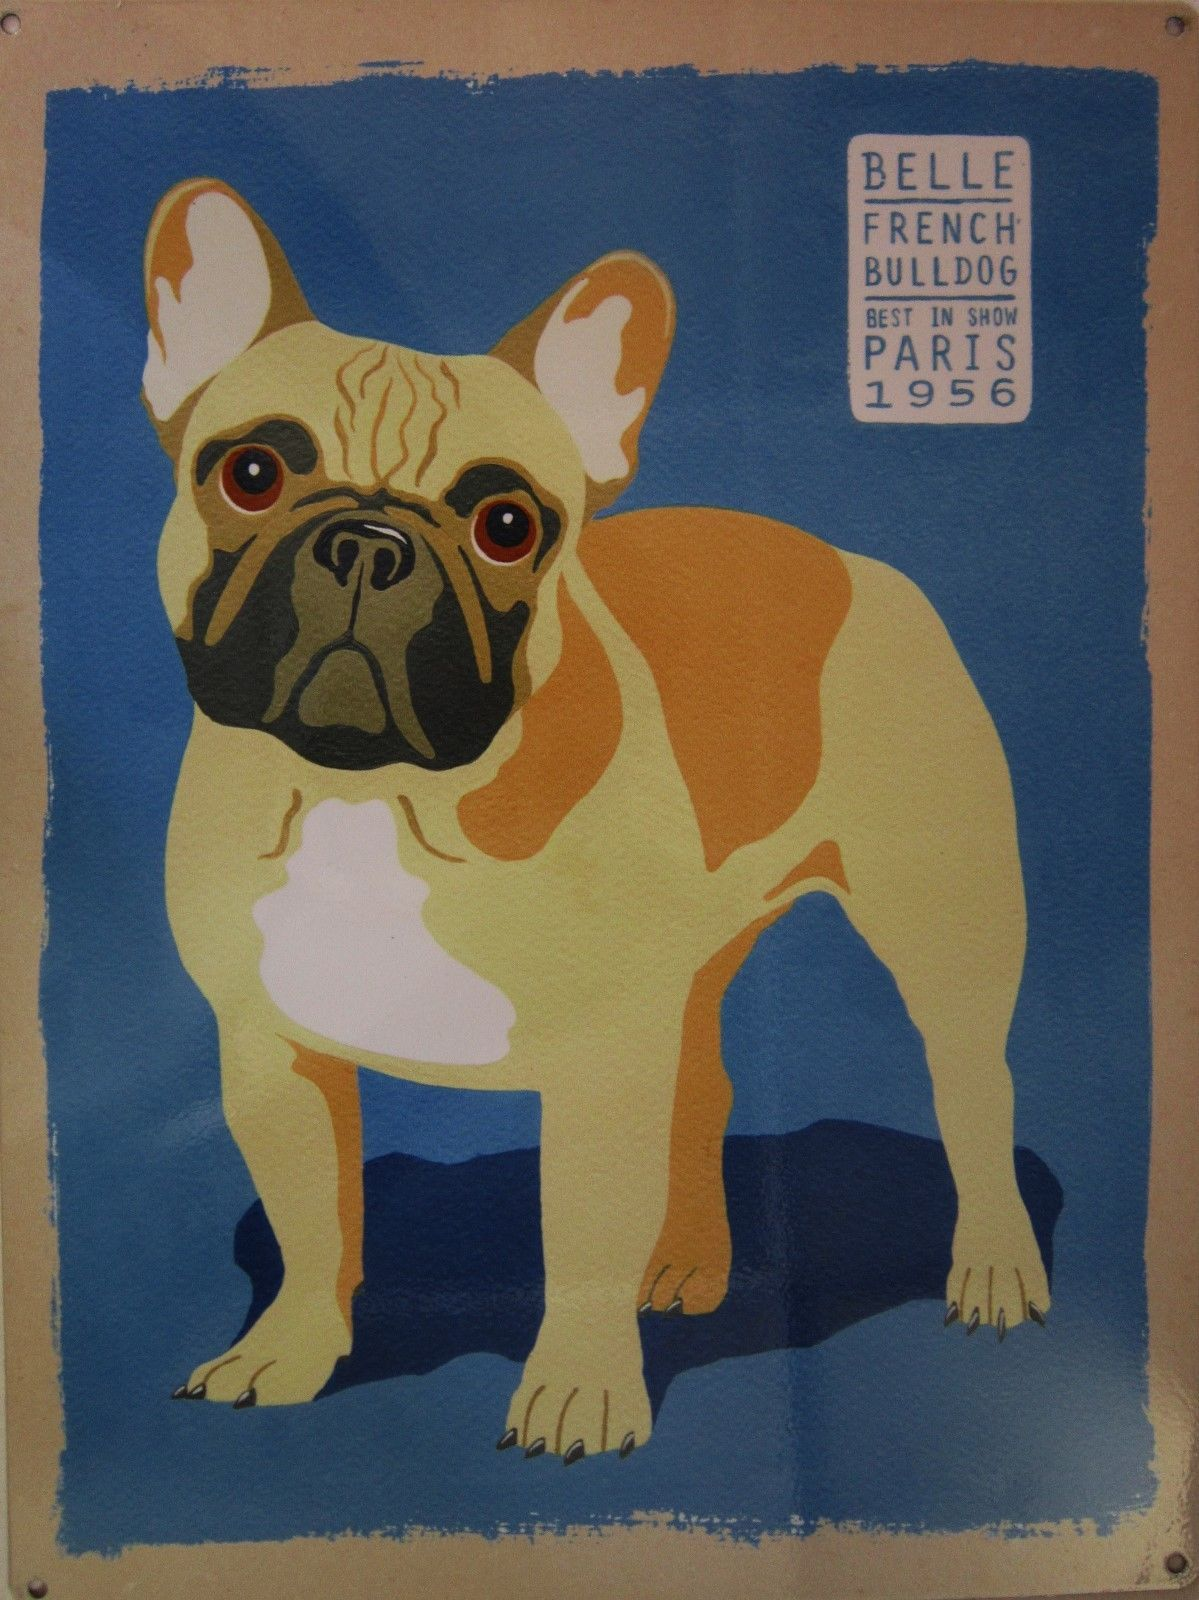 Belle French Bulldog Metal Sign - $19.95